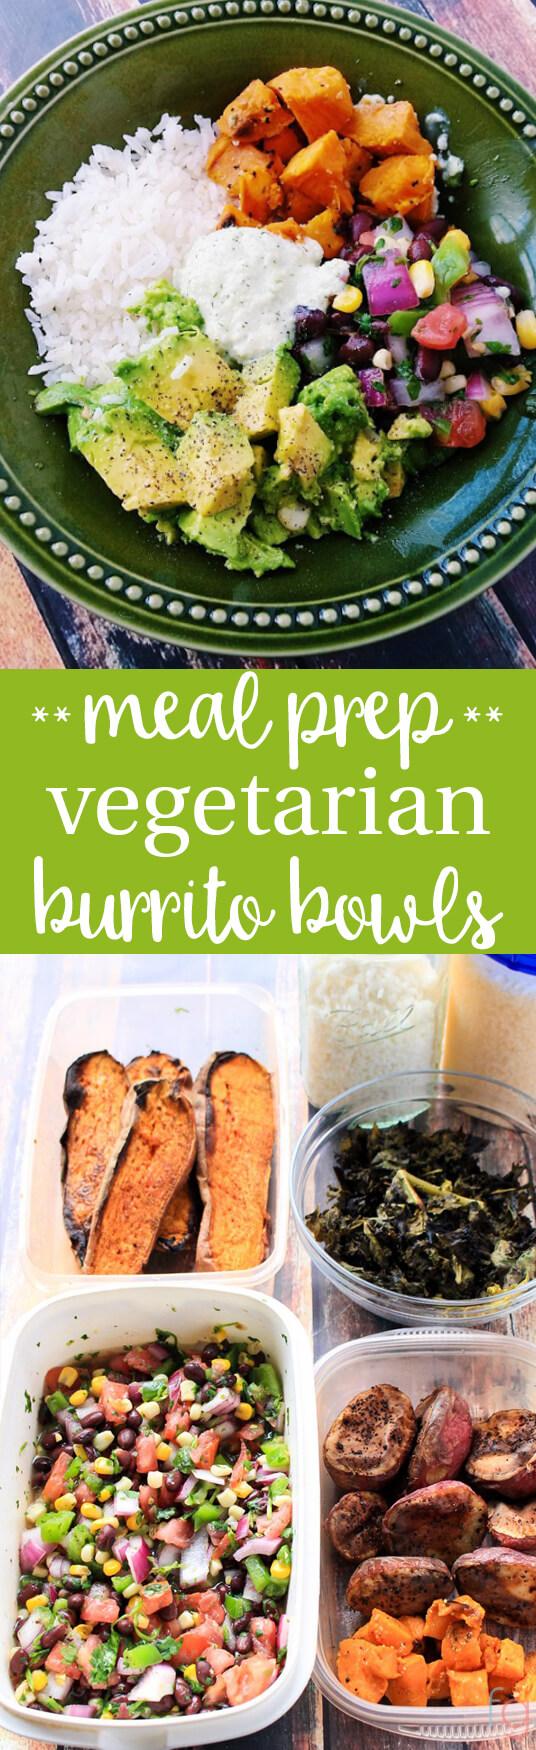 Weekly Meal Prep: Veggie Burrito Bowls - Frugality Gal